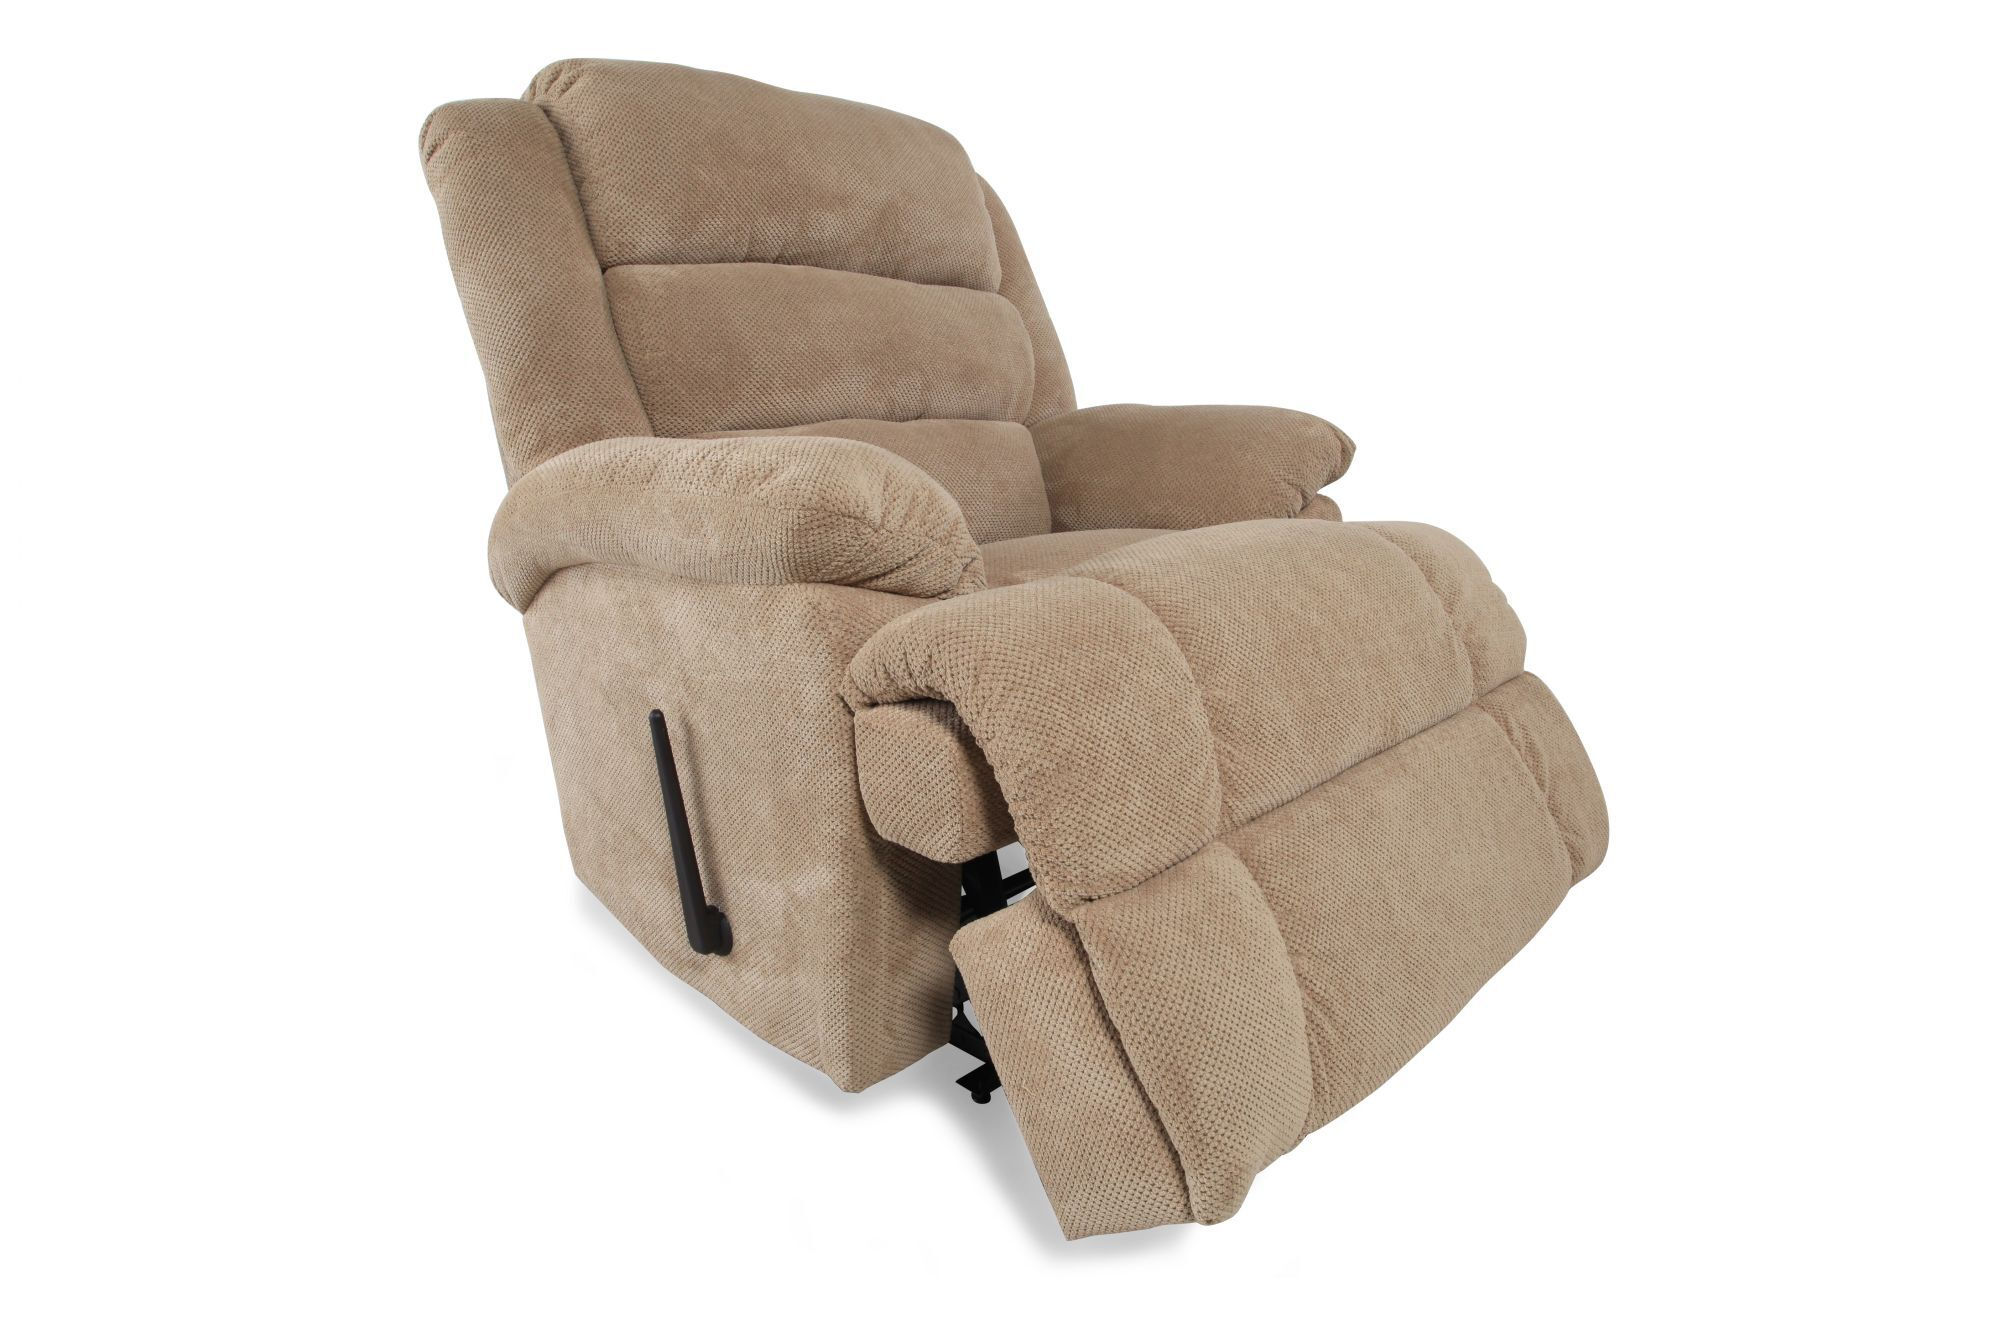 Lane Knox Tan Comfort King Recliner  sc 1 st  Mathis Brothers & Lane Knox Tan Comfort King Recliner | Mathis Brothers Furniture islam-shia.org